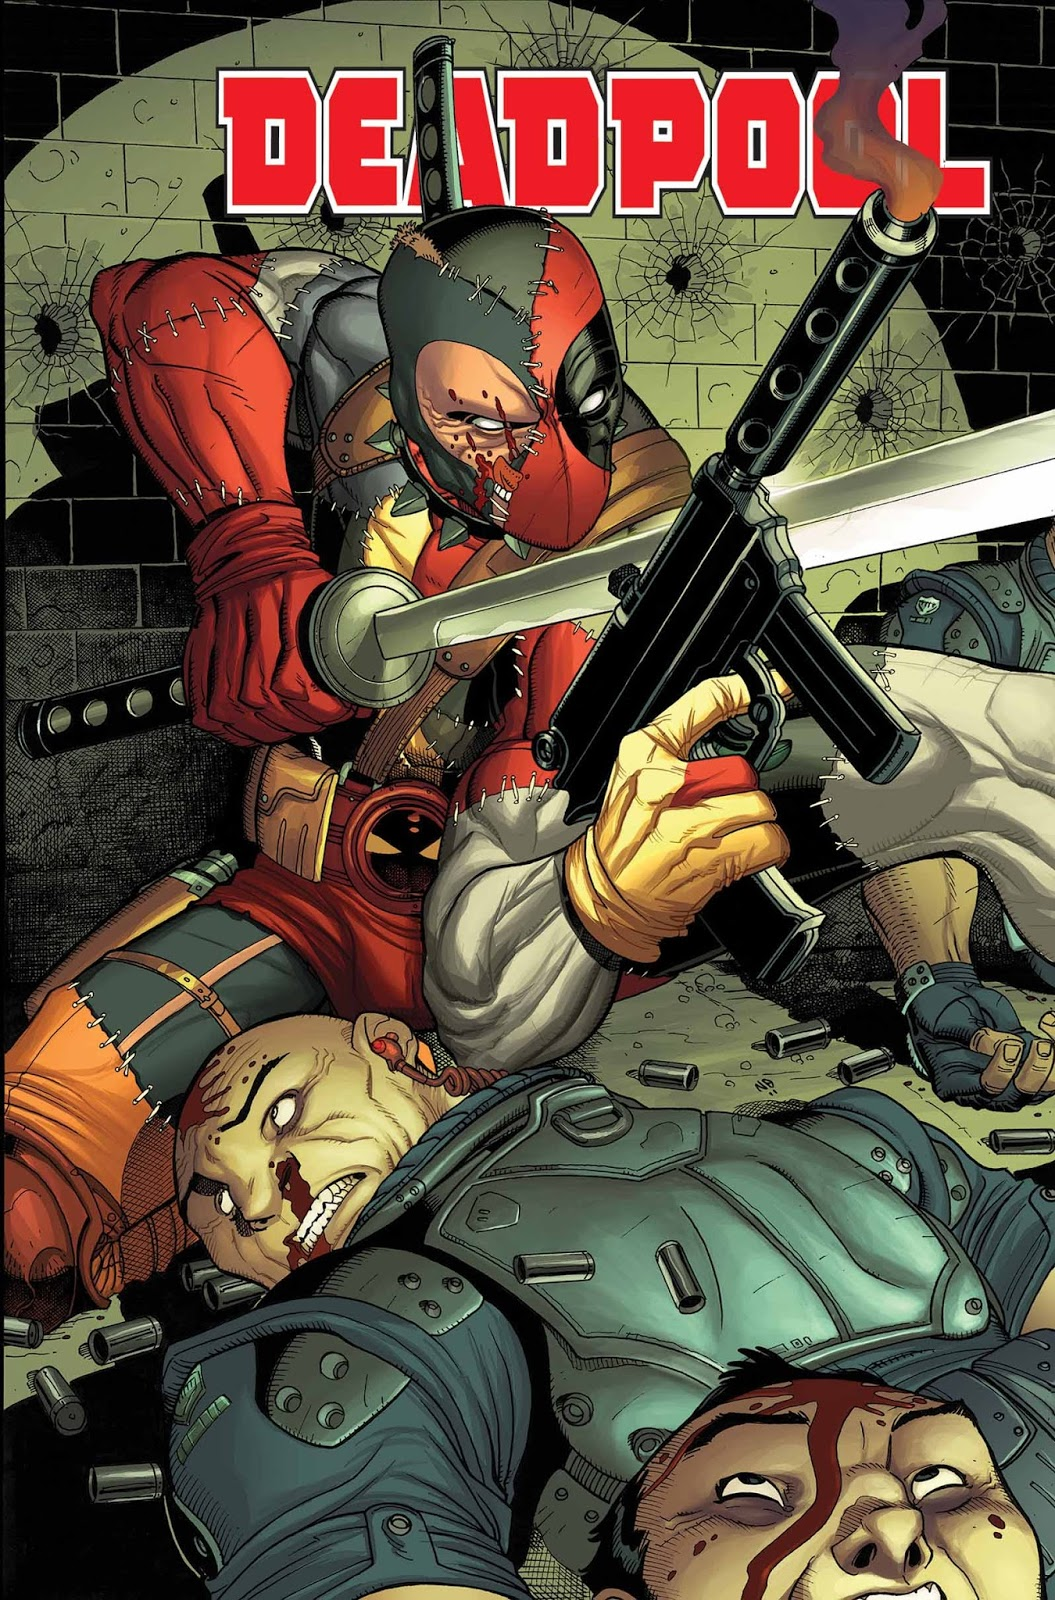 Marvel Reprinting 10 Classic Deadpool Comics in January 2016 | Deadpool Bugle